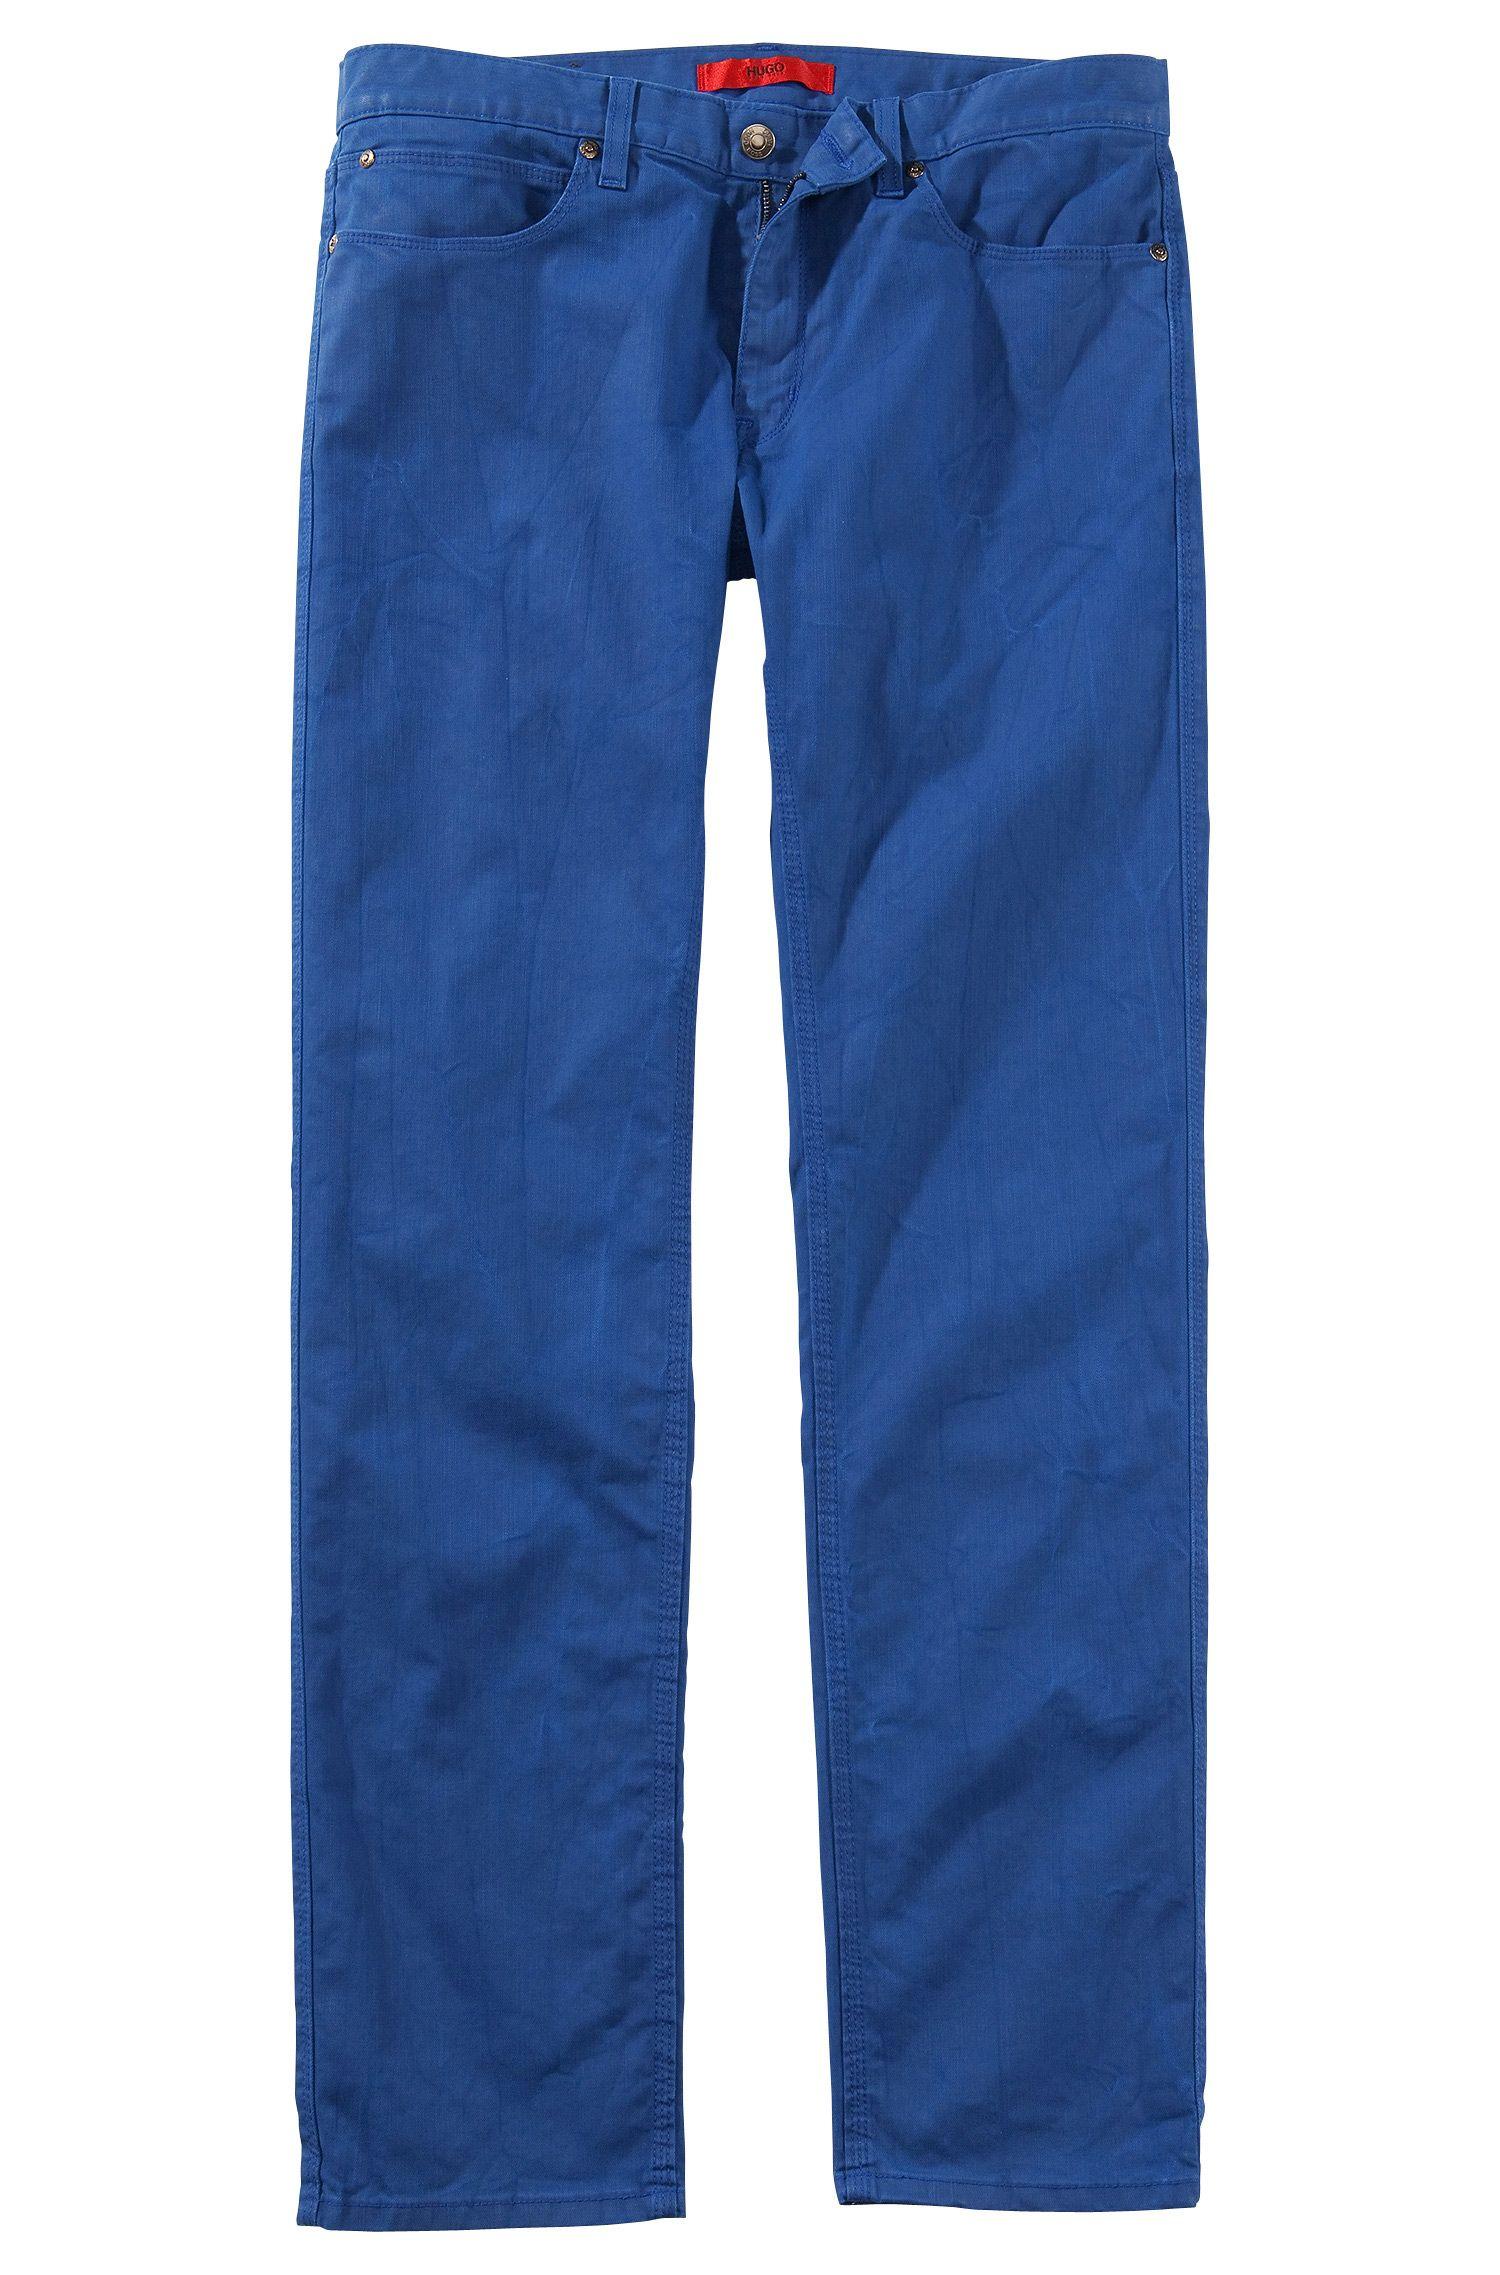 Jeans ´HUGO 708` mit Glanz-Finish